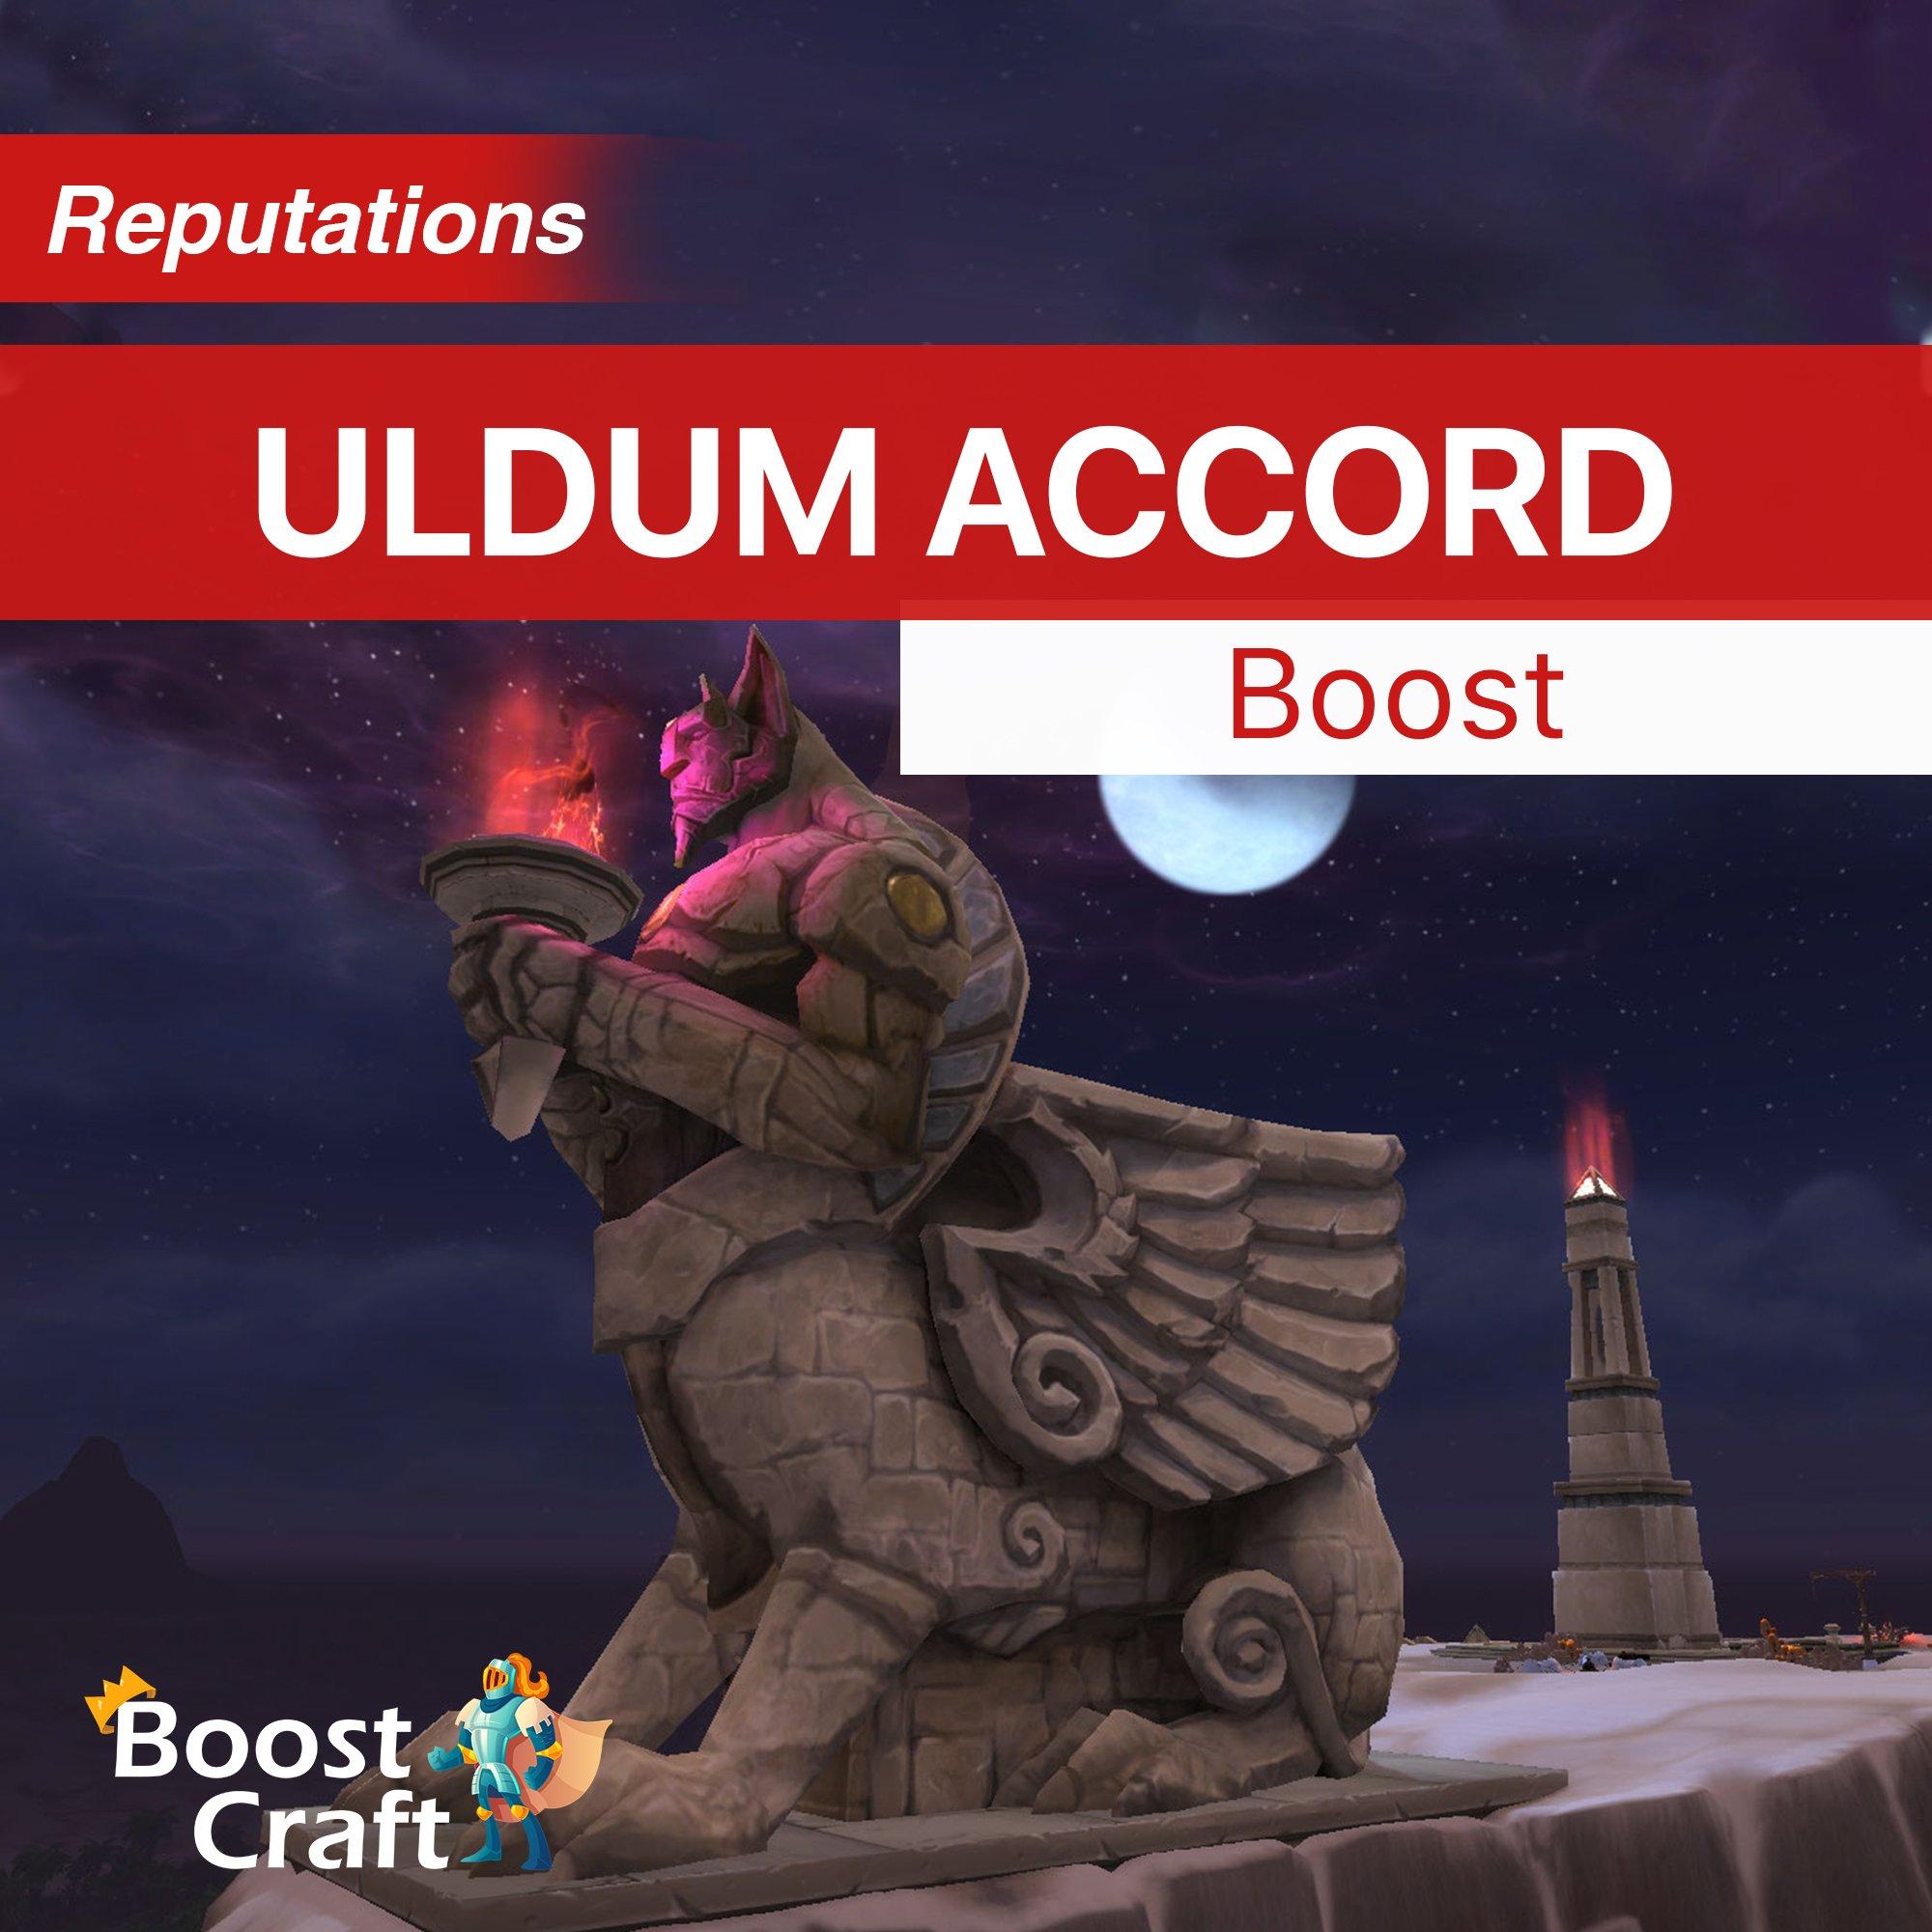 Uldum Accord – 8.3 Reputation Farm Service